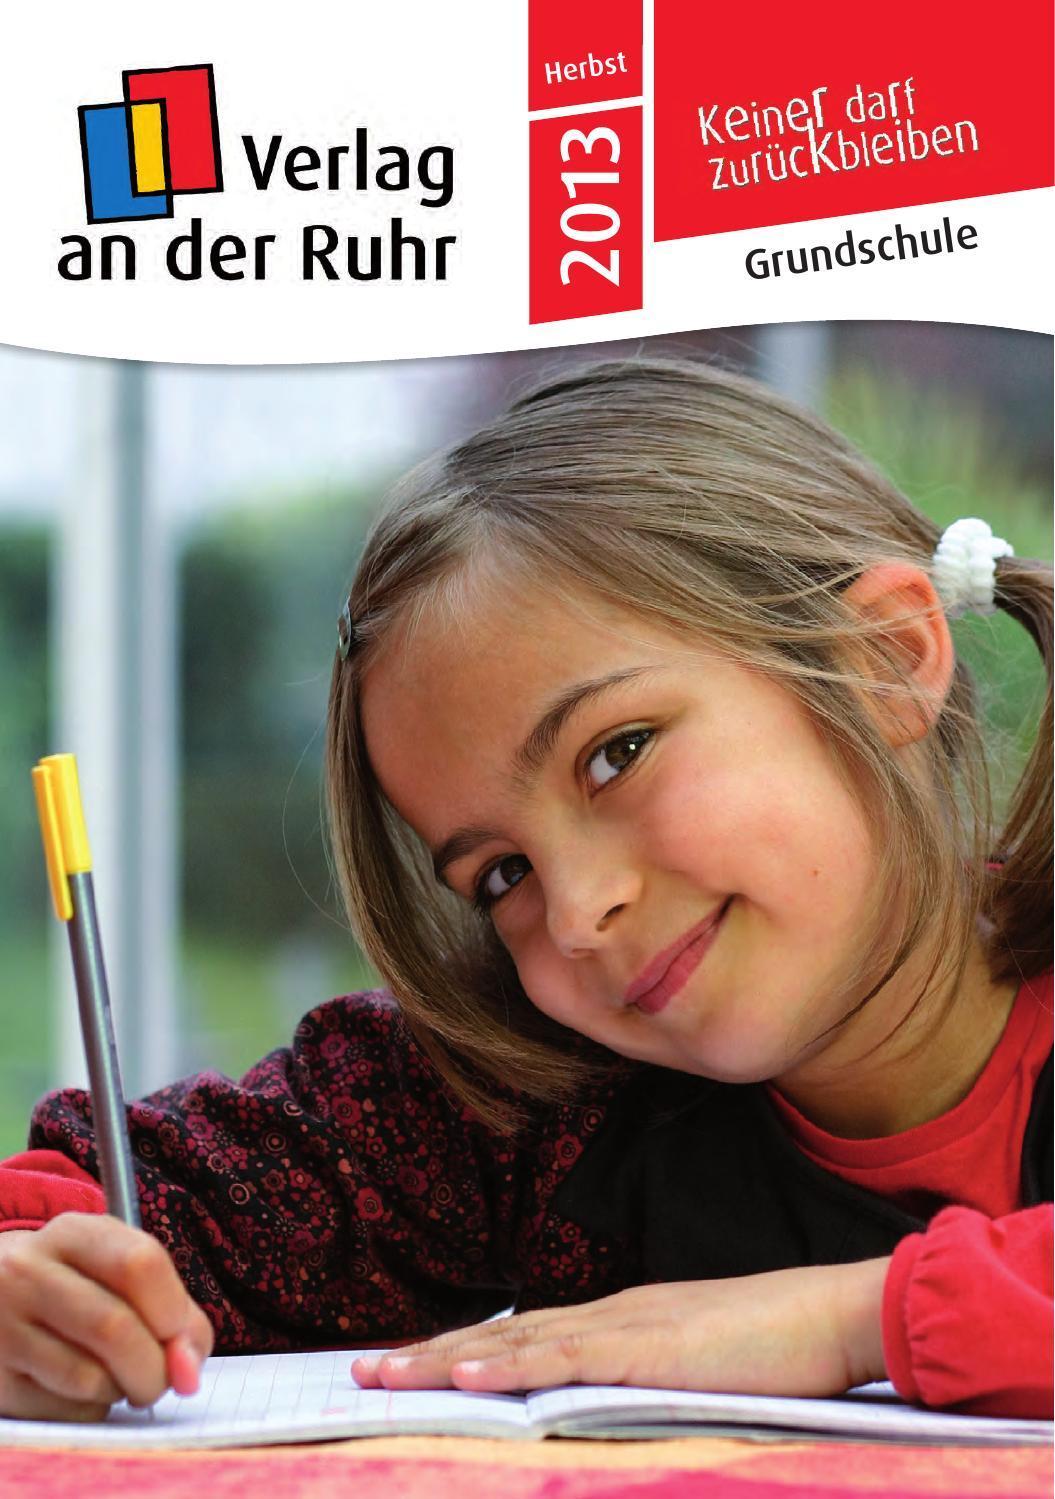 Verlag an der Ruhr - Katalog Grundschule 2013 Herbst by Verlag an ...